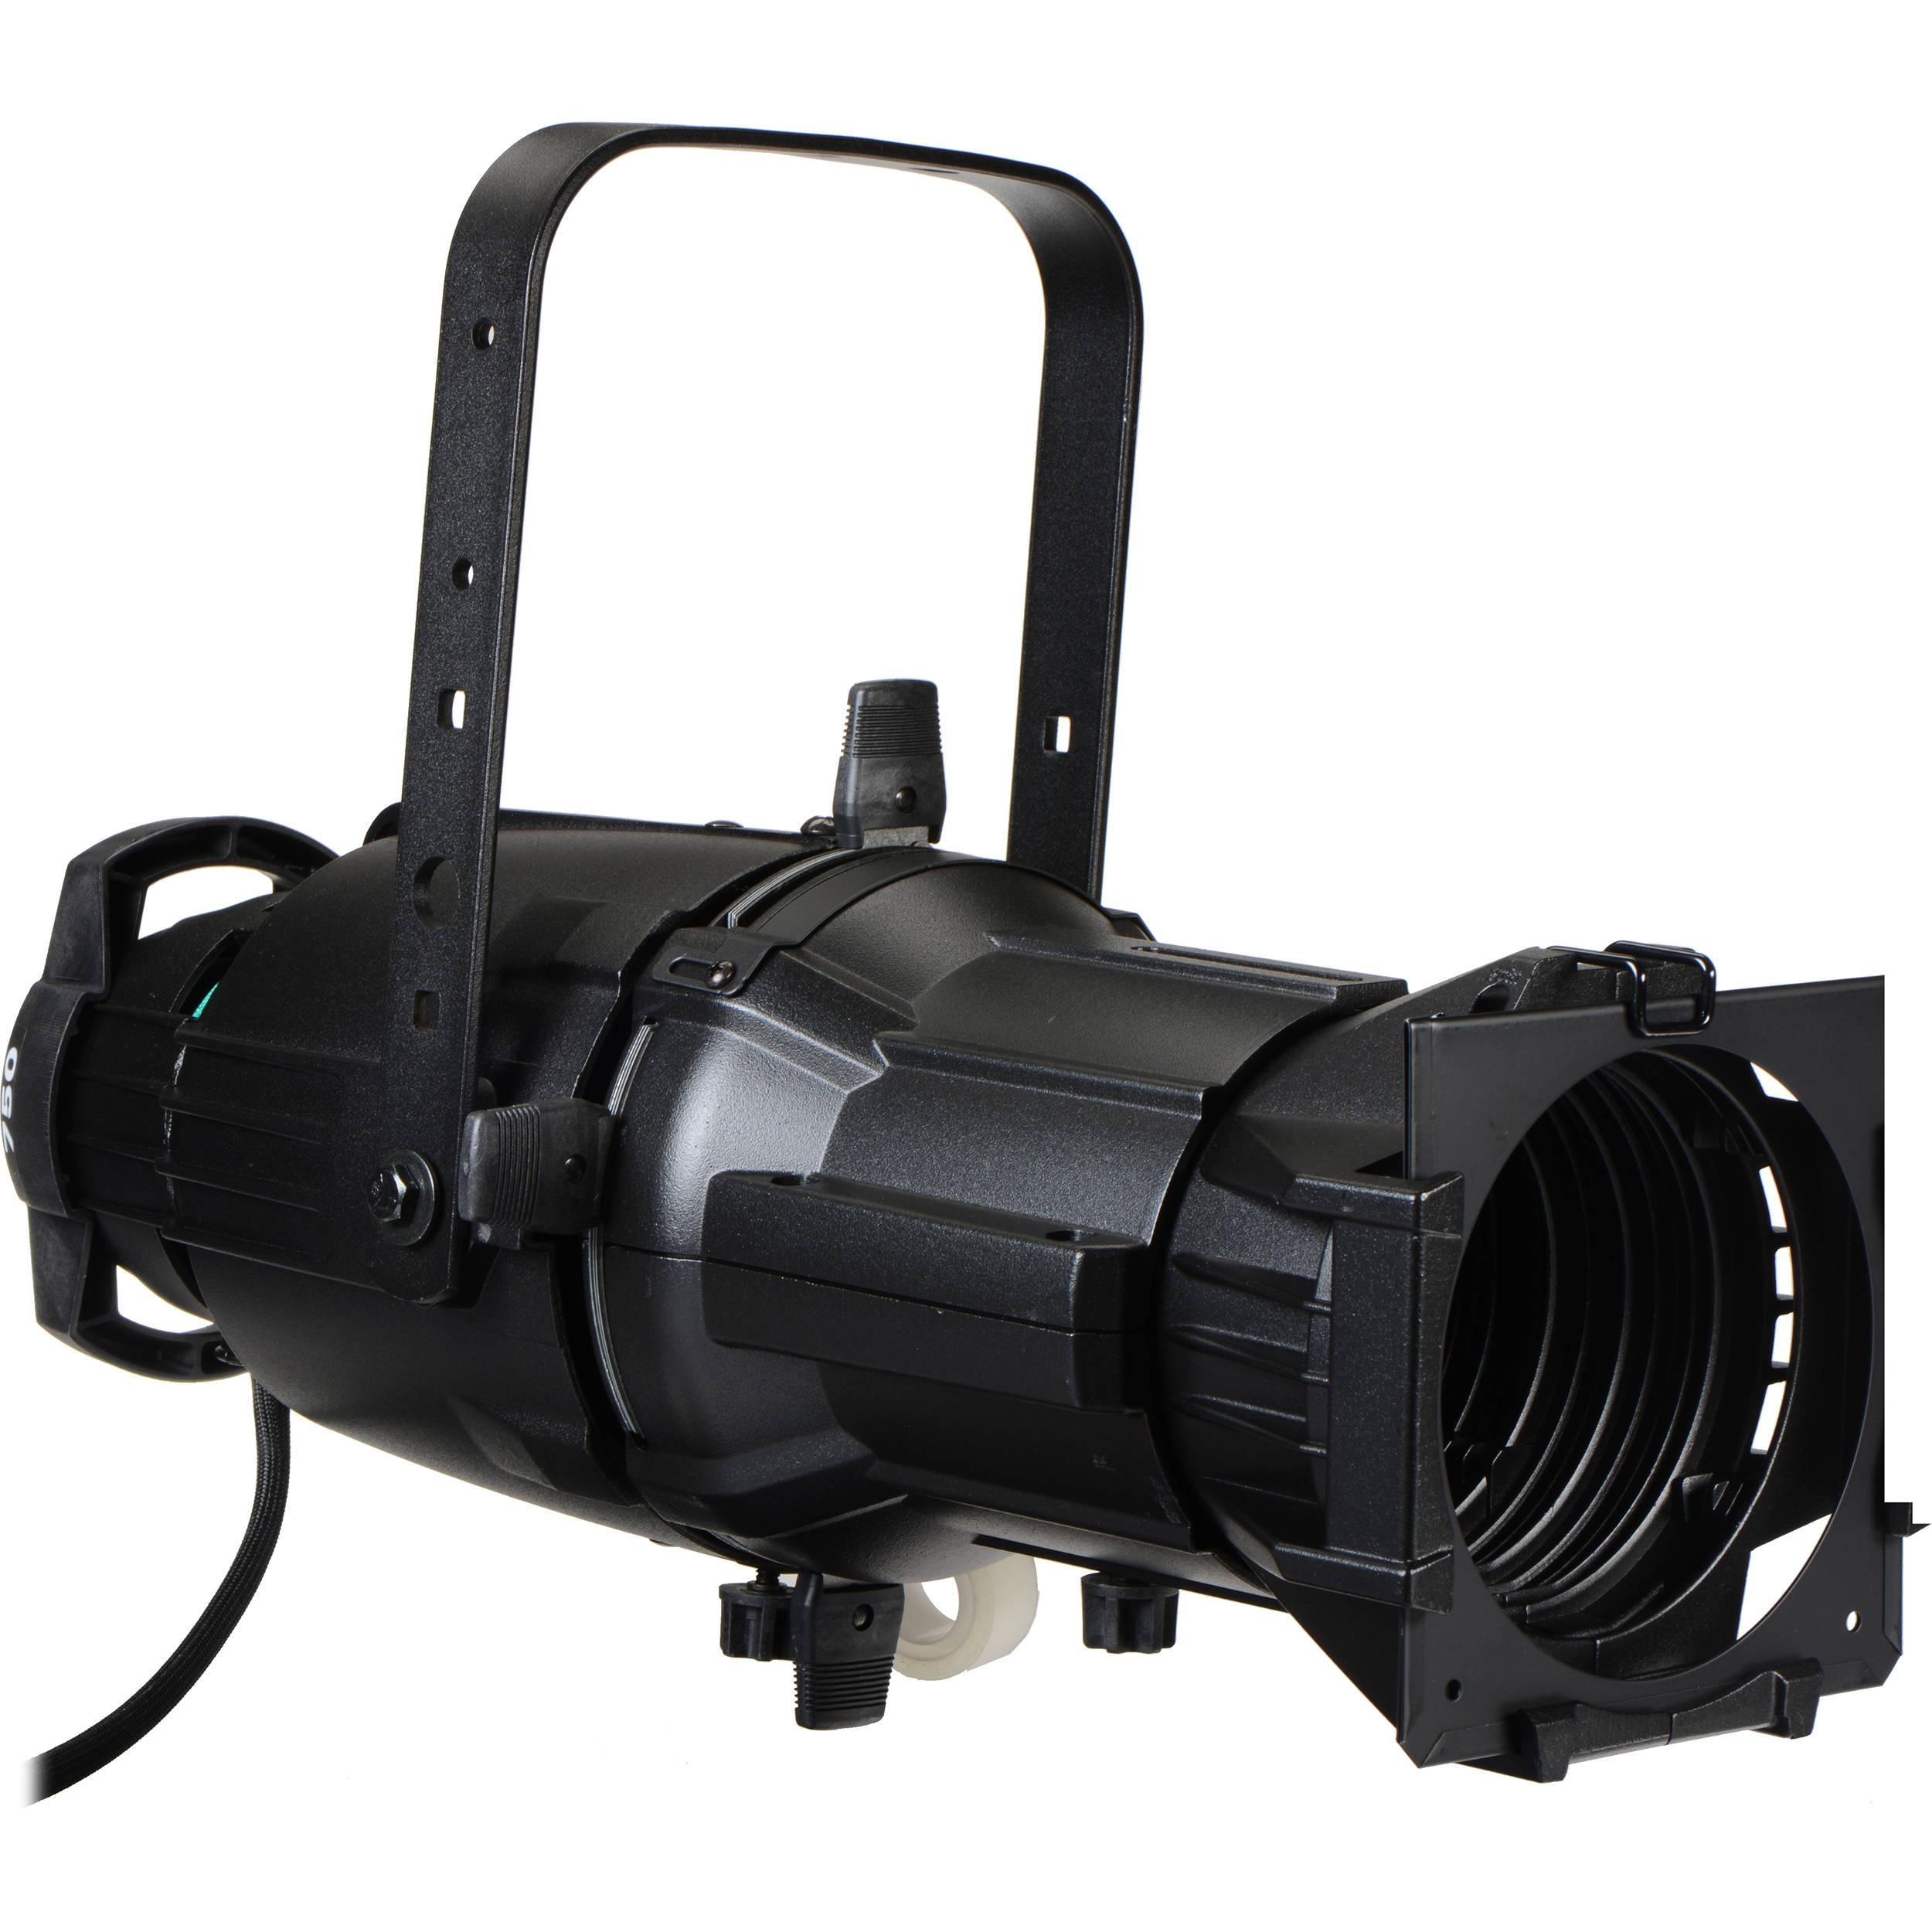 Etc source 4 750 watt ellipsoidal spotlight black edison plug 50 degrees 115 240v ac